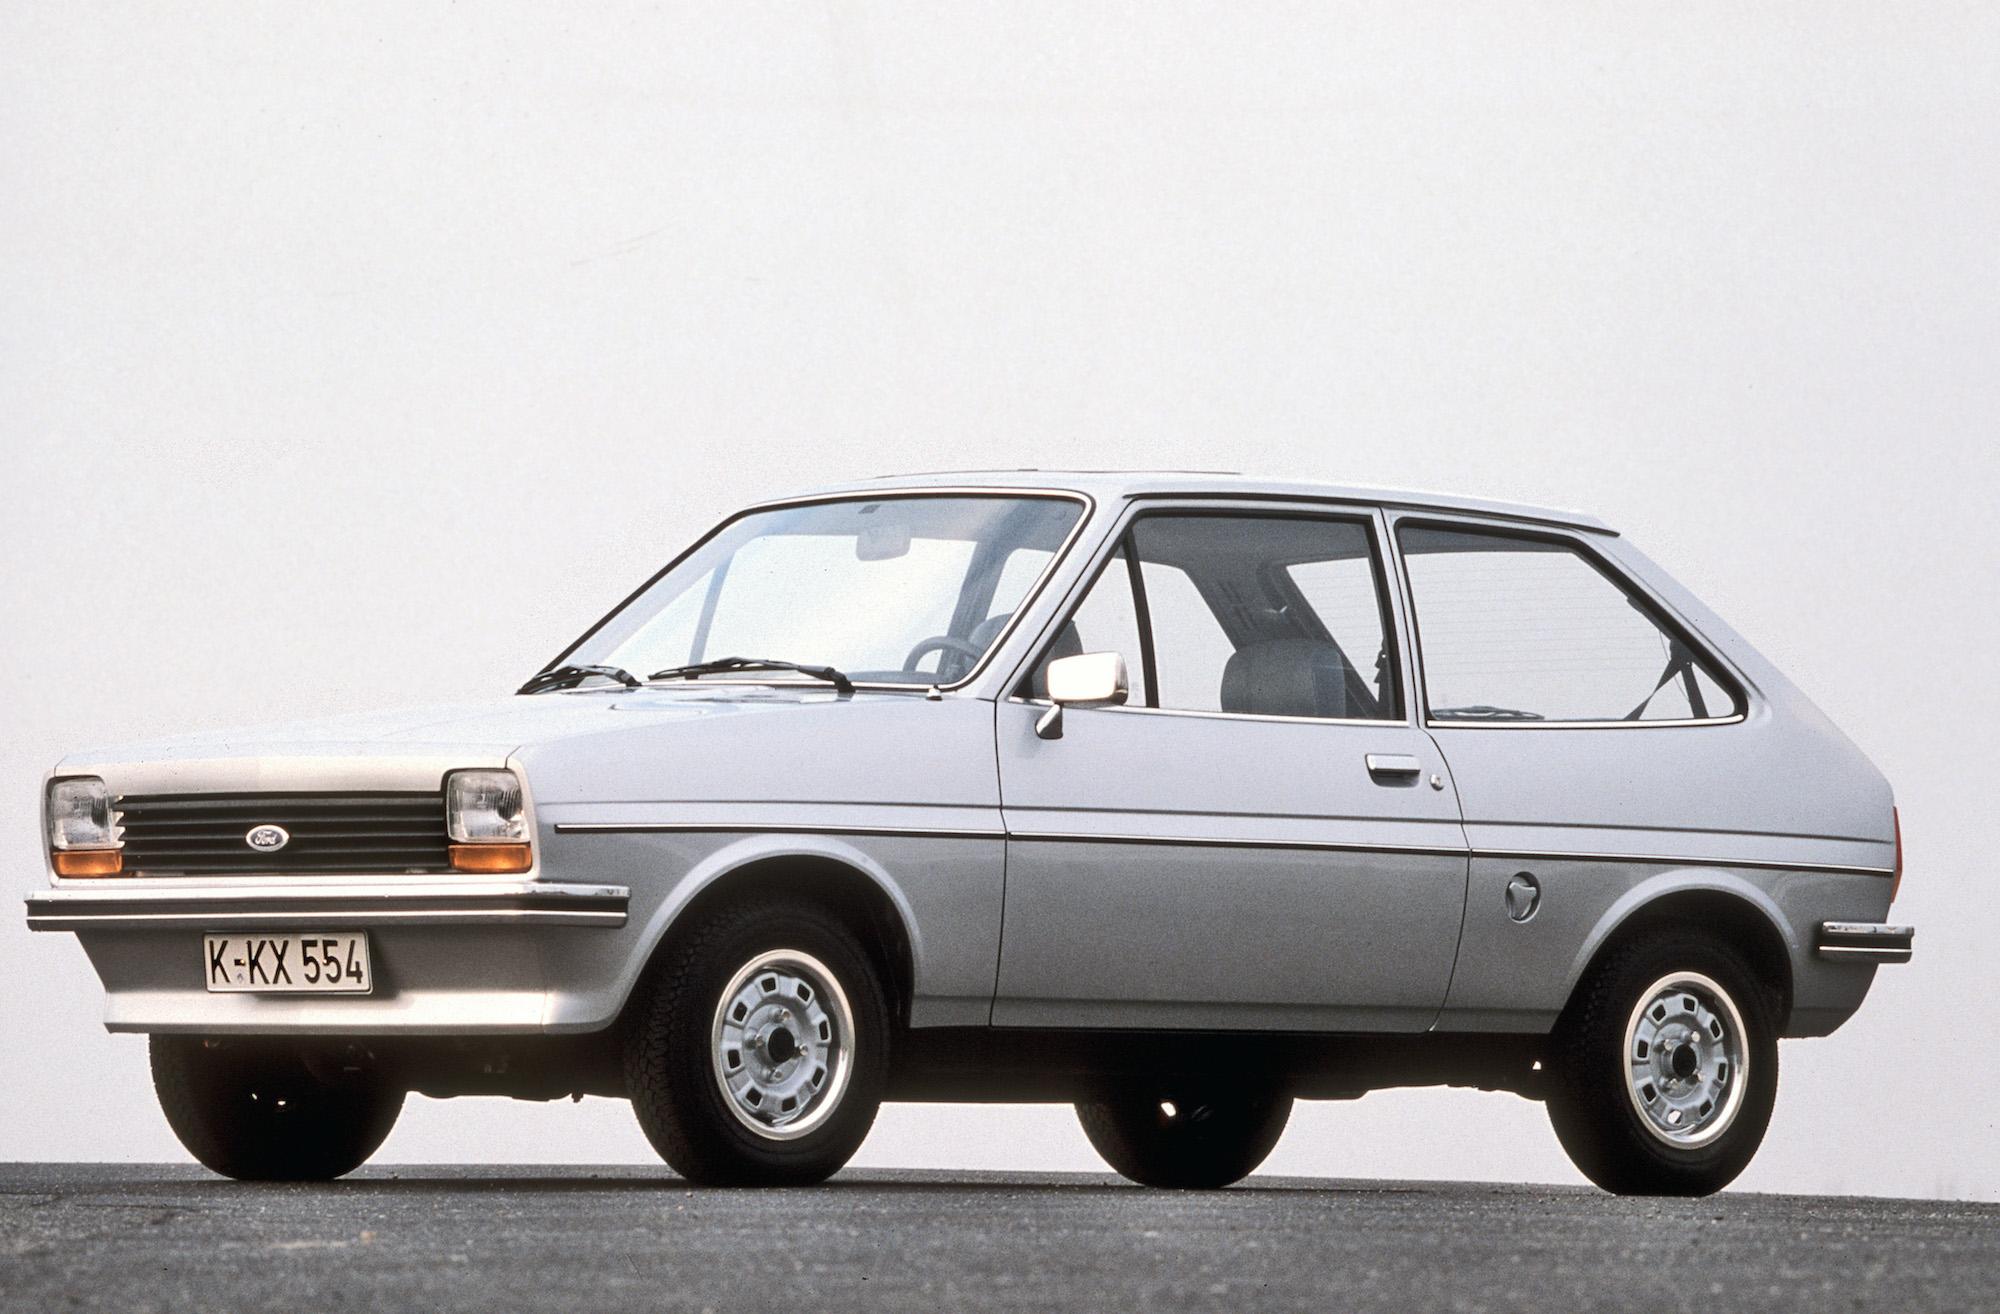 Ford Fiesta 1.3 GL 1976